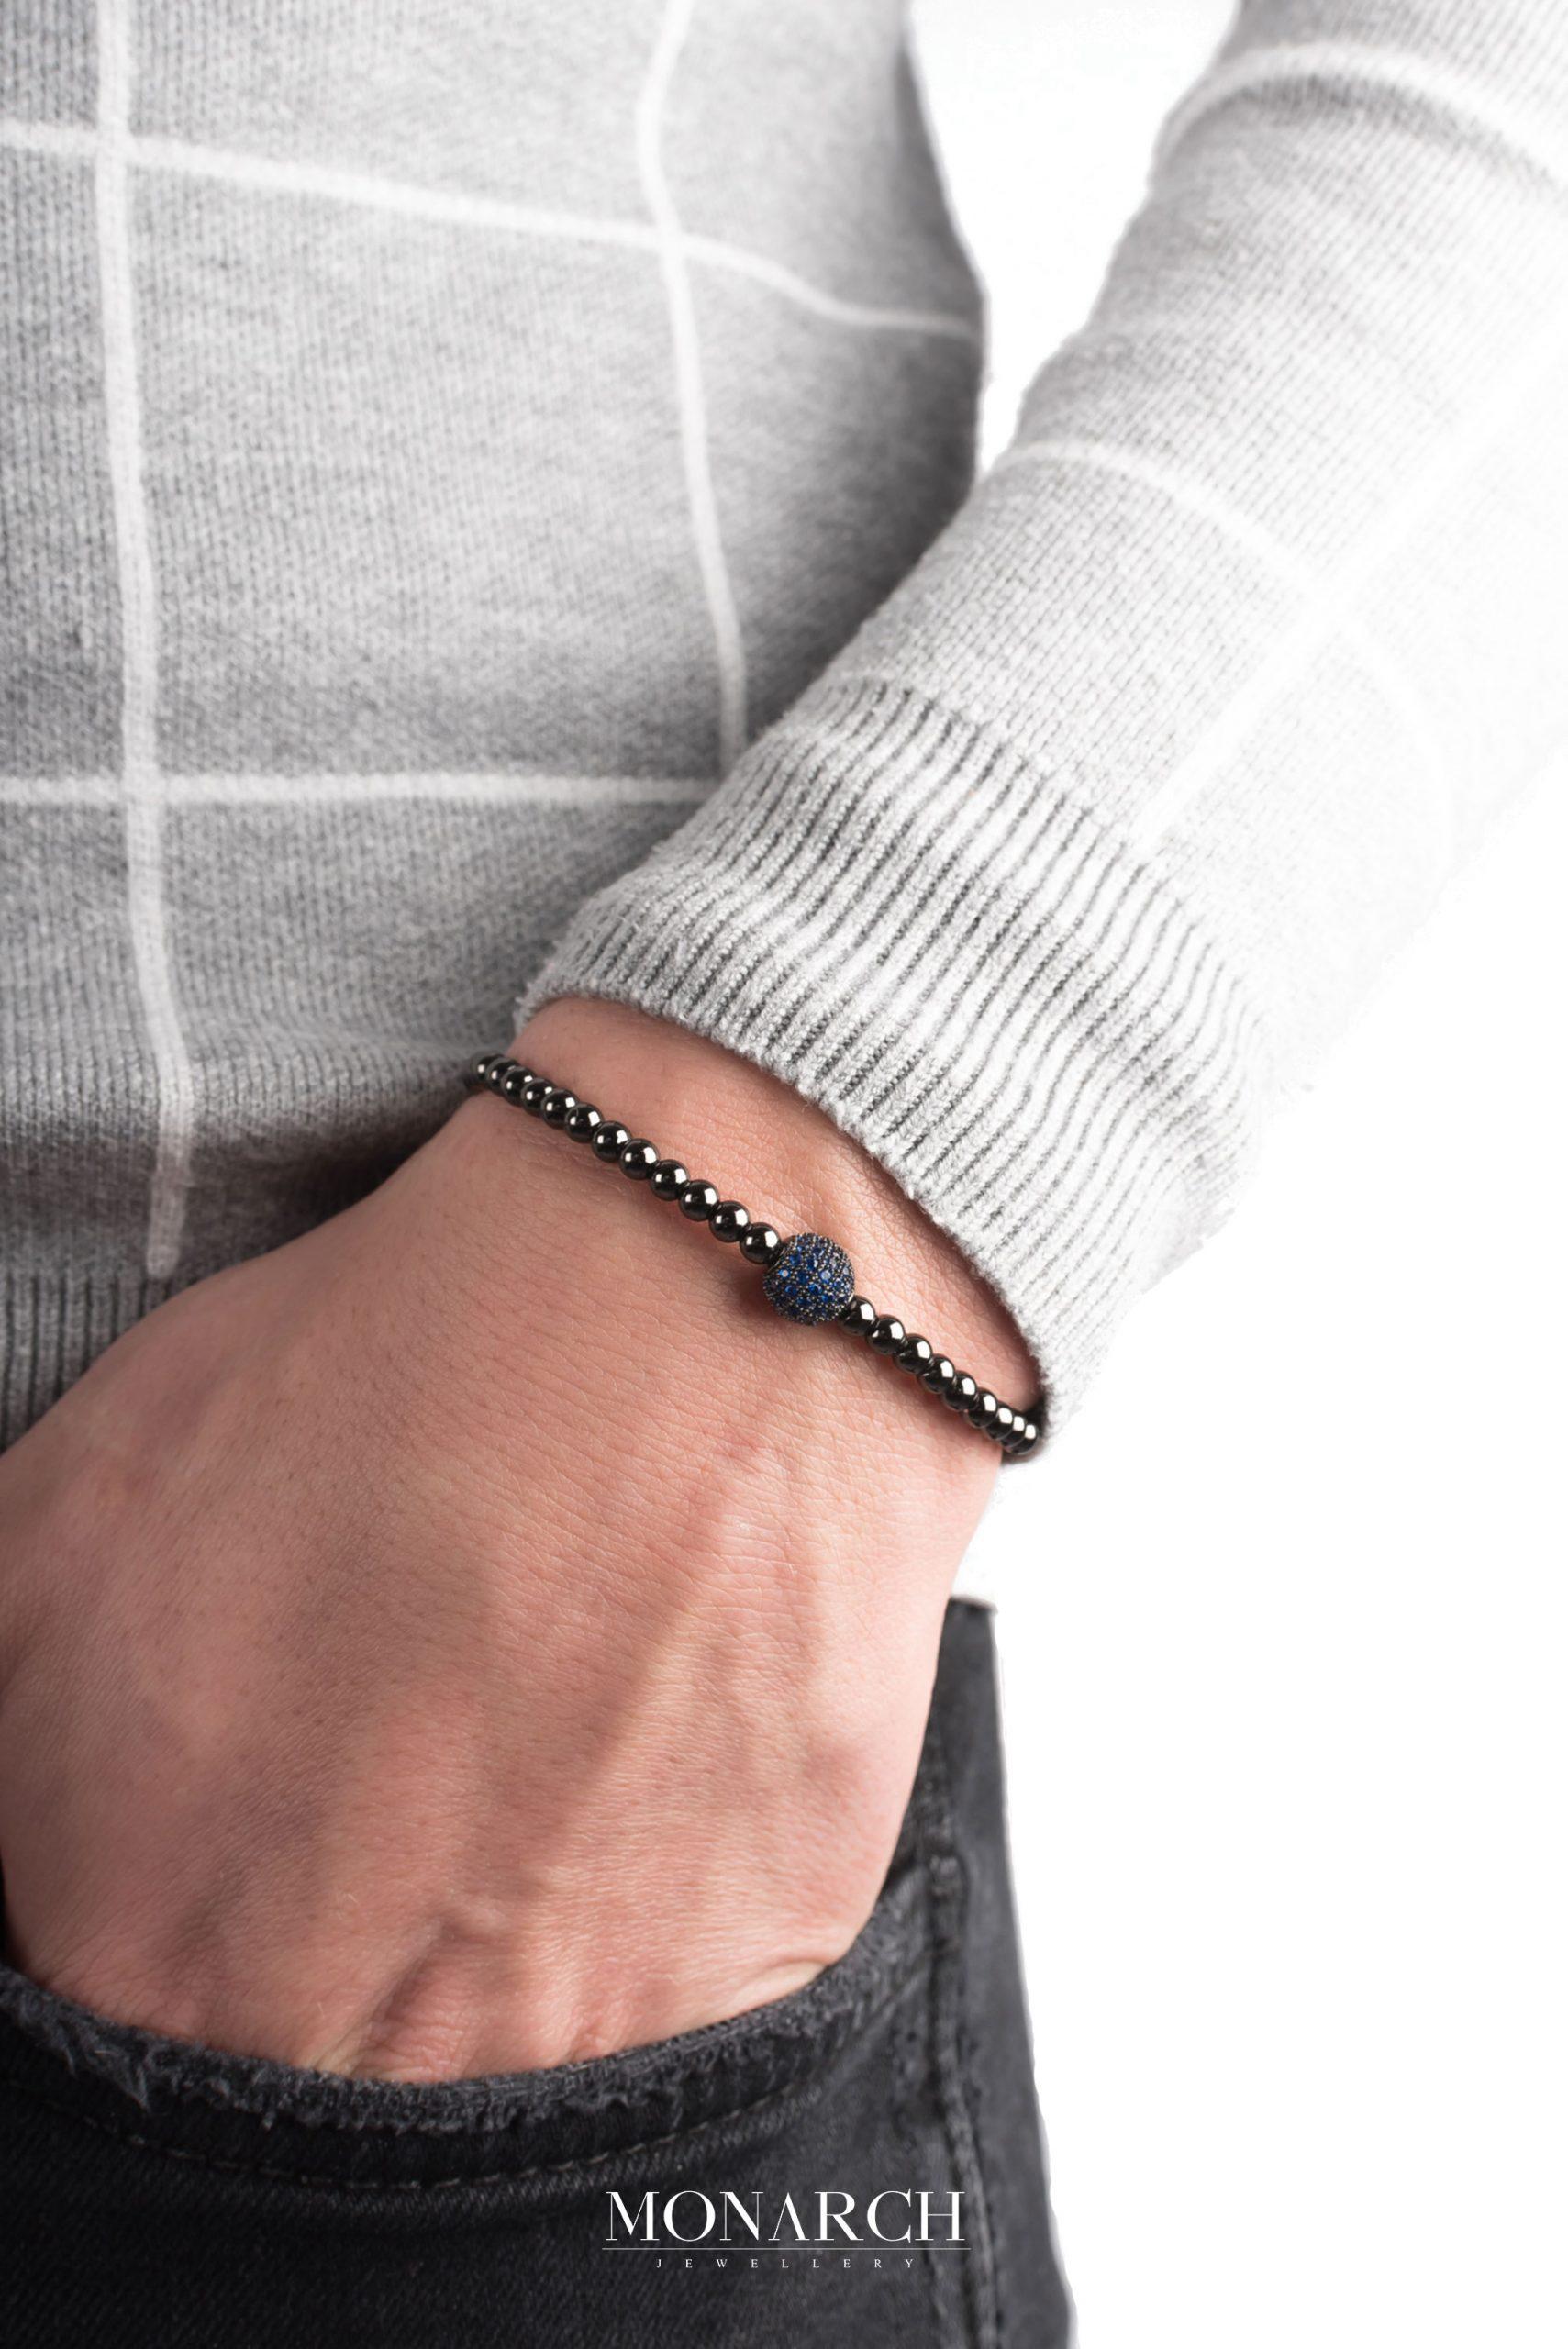 black luxury bracelet for man, monarch jewellery MA60BAZS